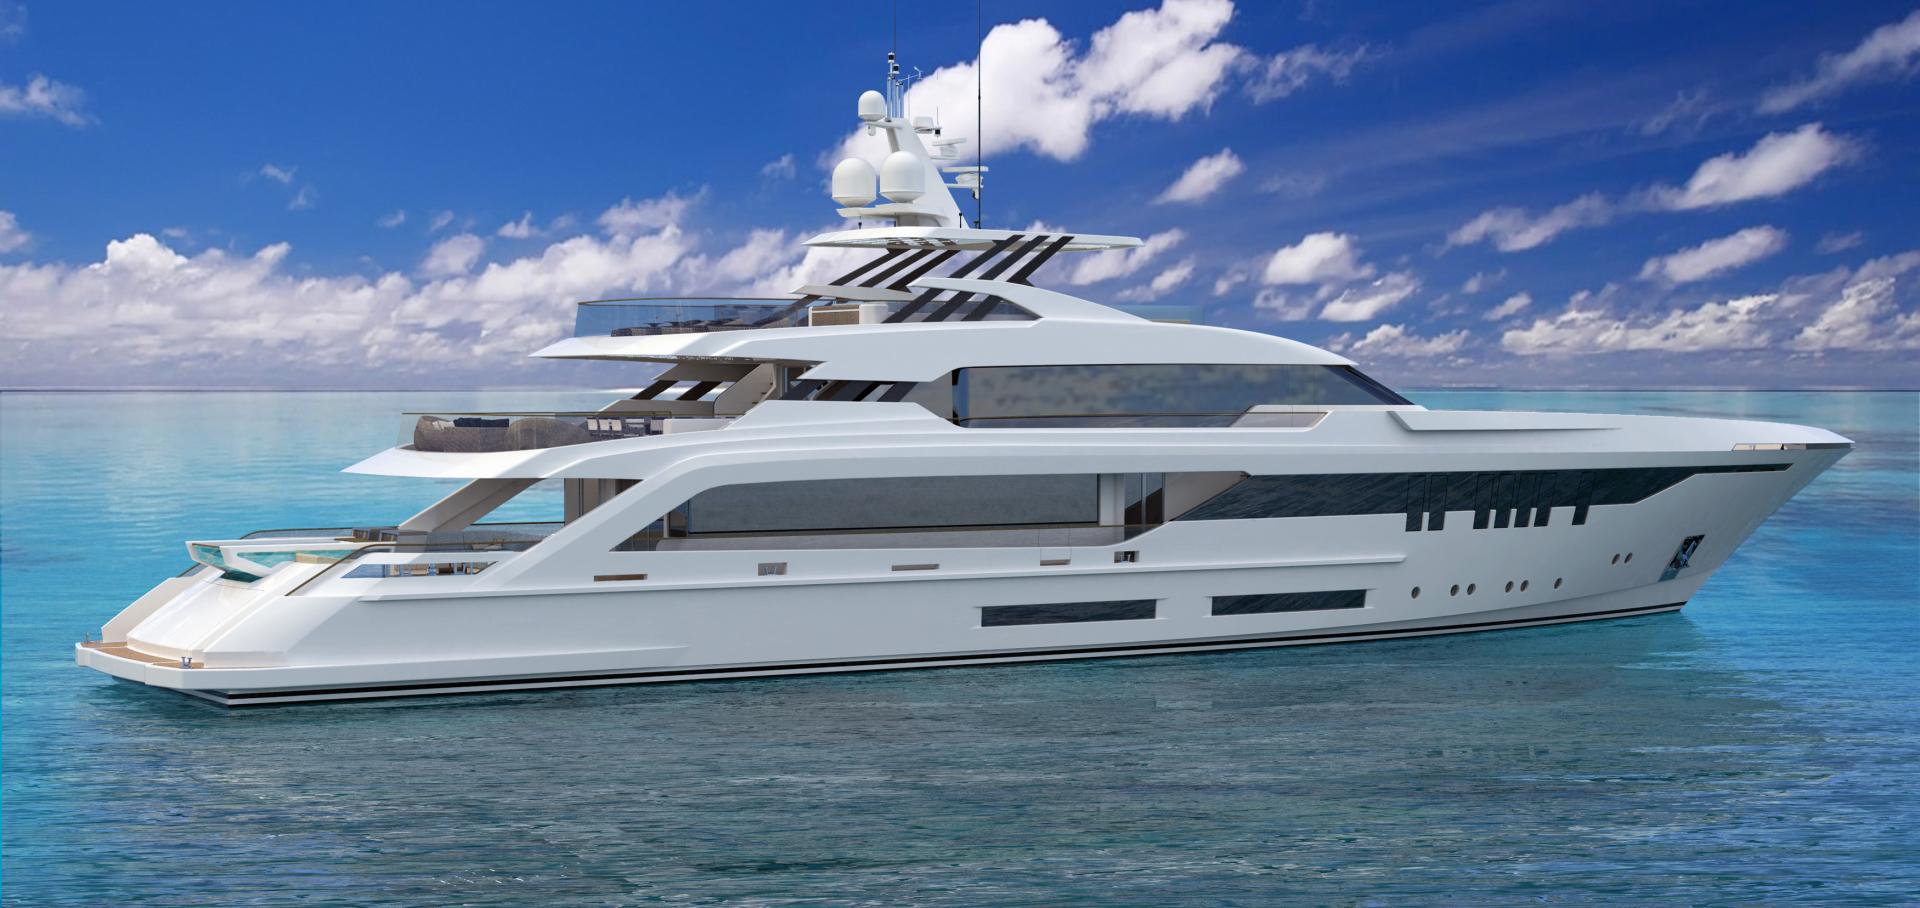 GHI Yachts 2023-THUNDERBIRD 165 Korea, Republic of-1337224 | Thumbnail